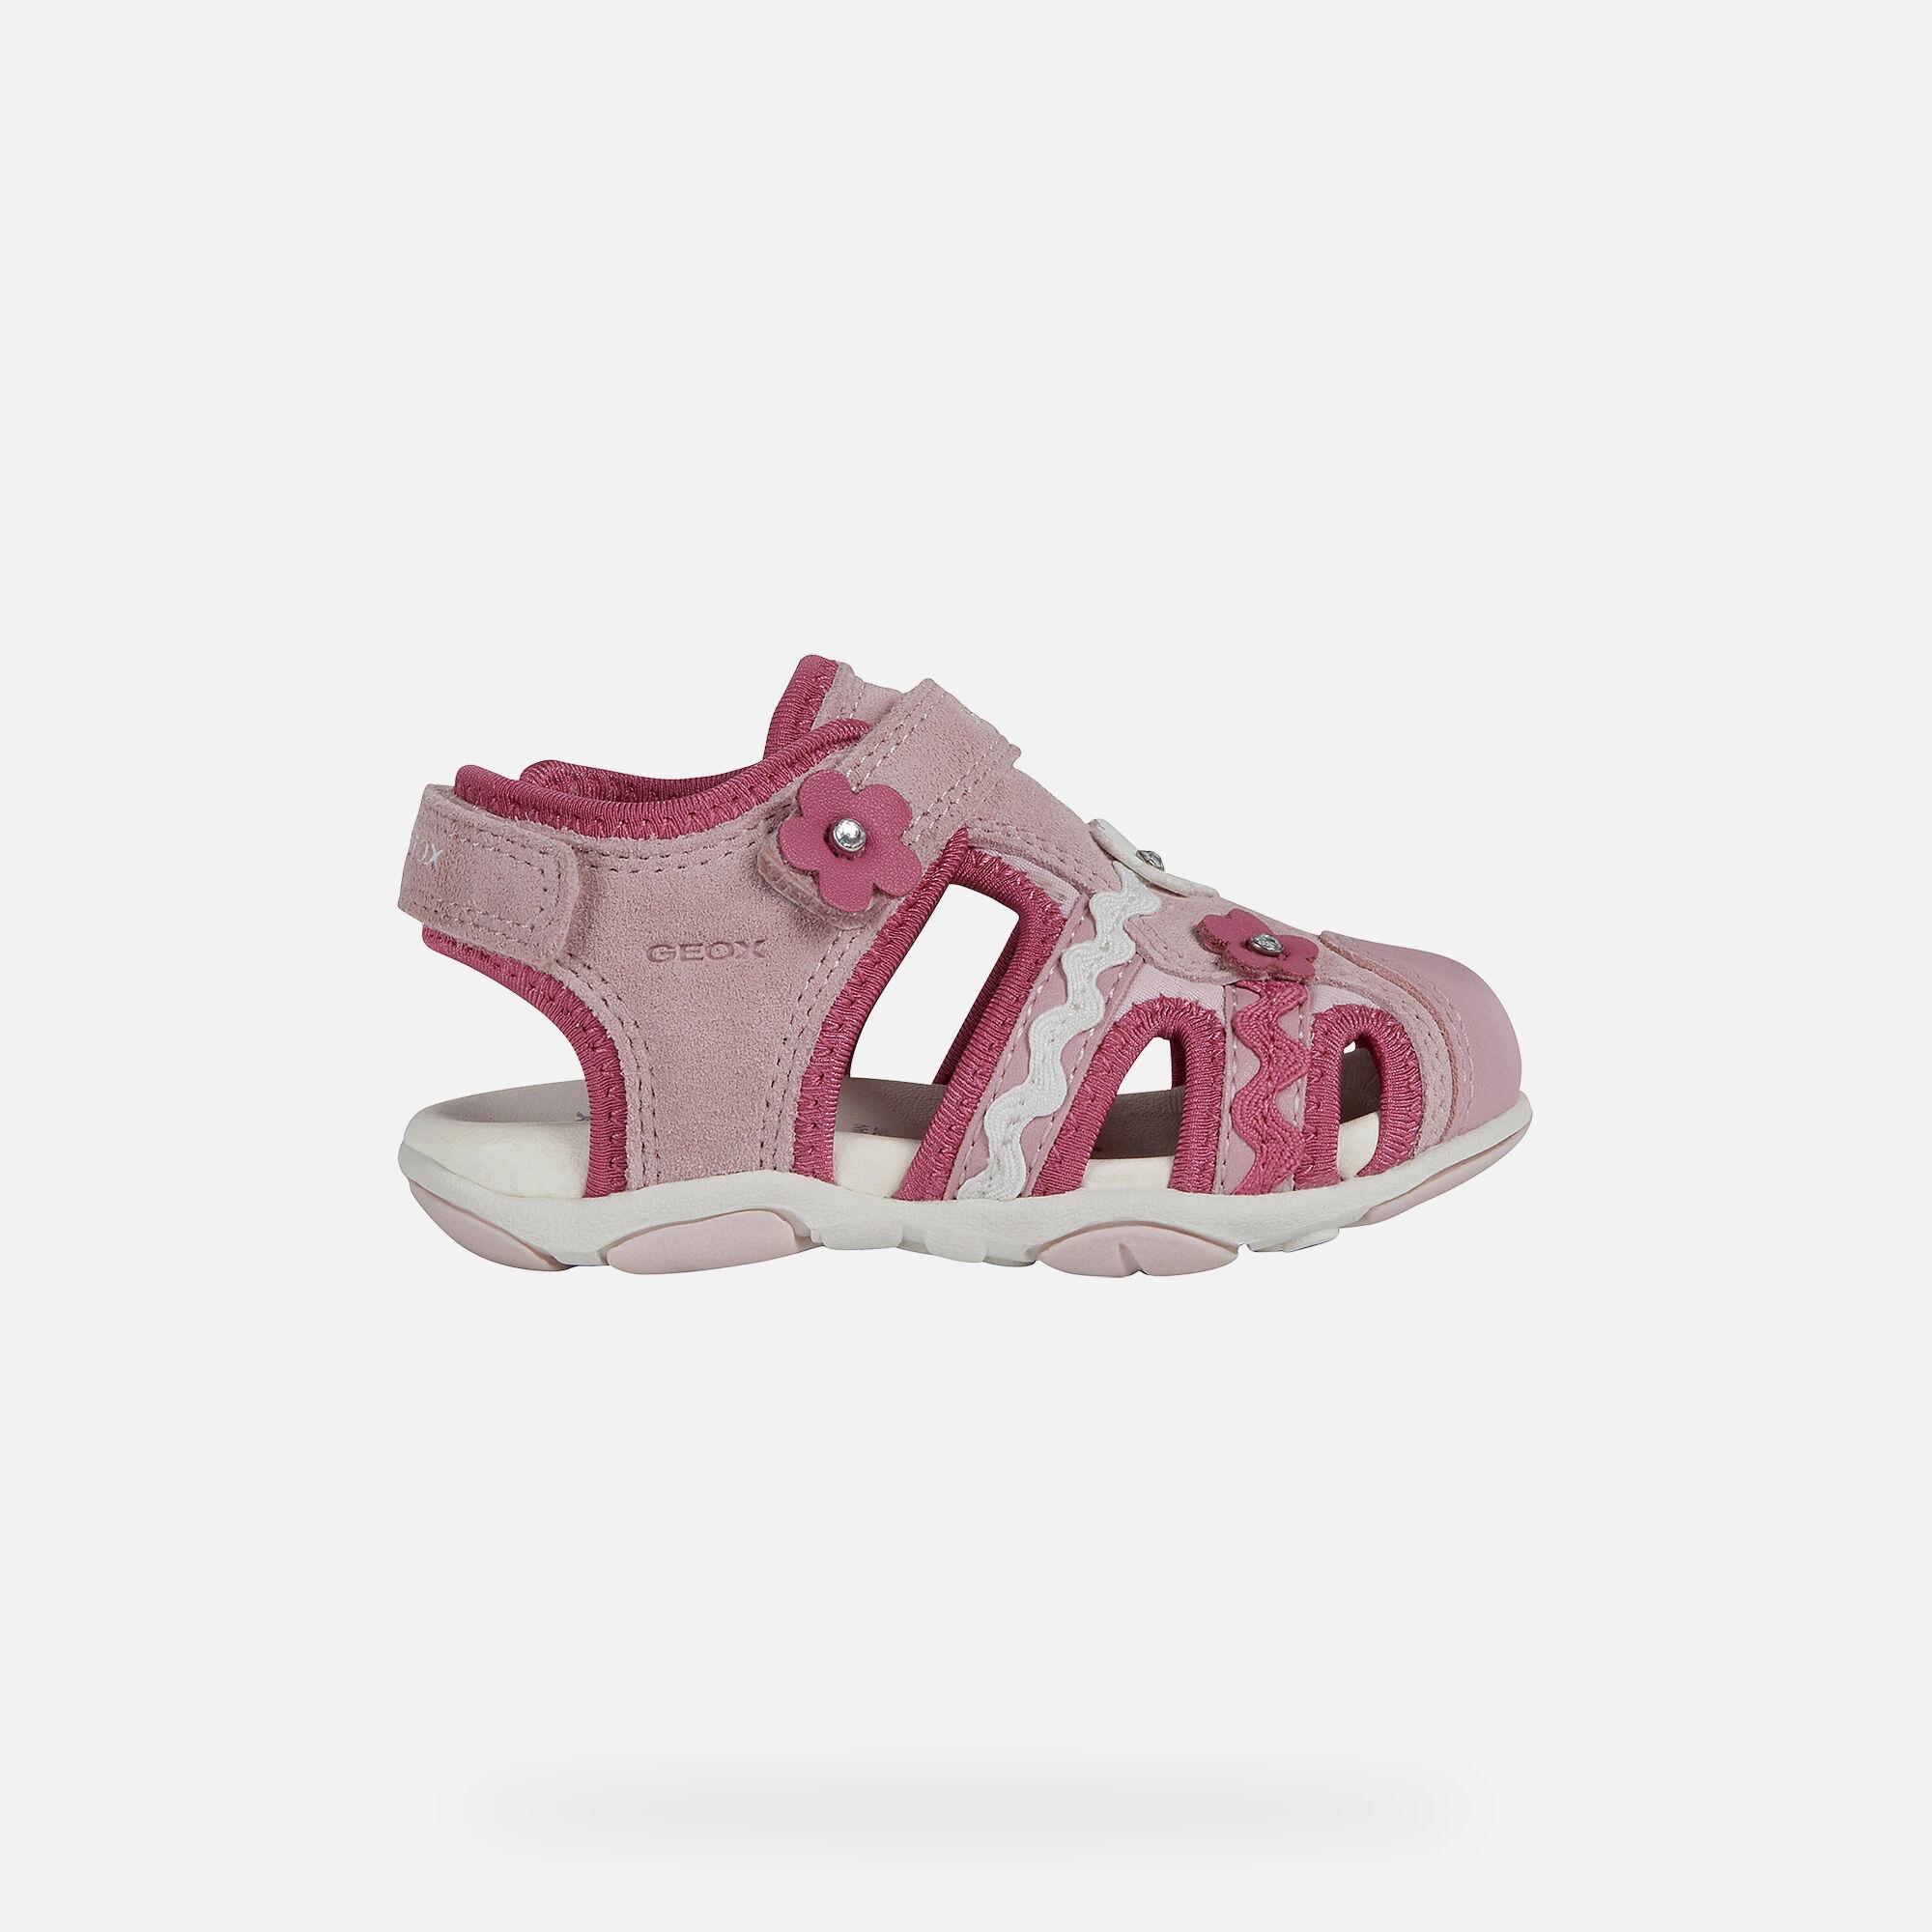 Geox AGASIM Baby Girl: Rose Sandals